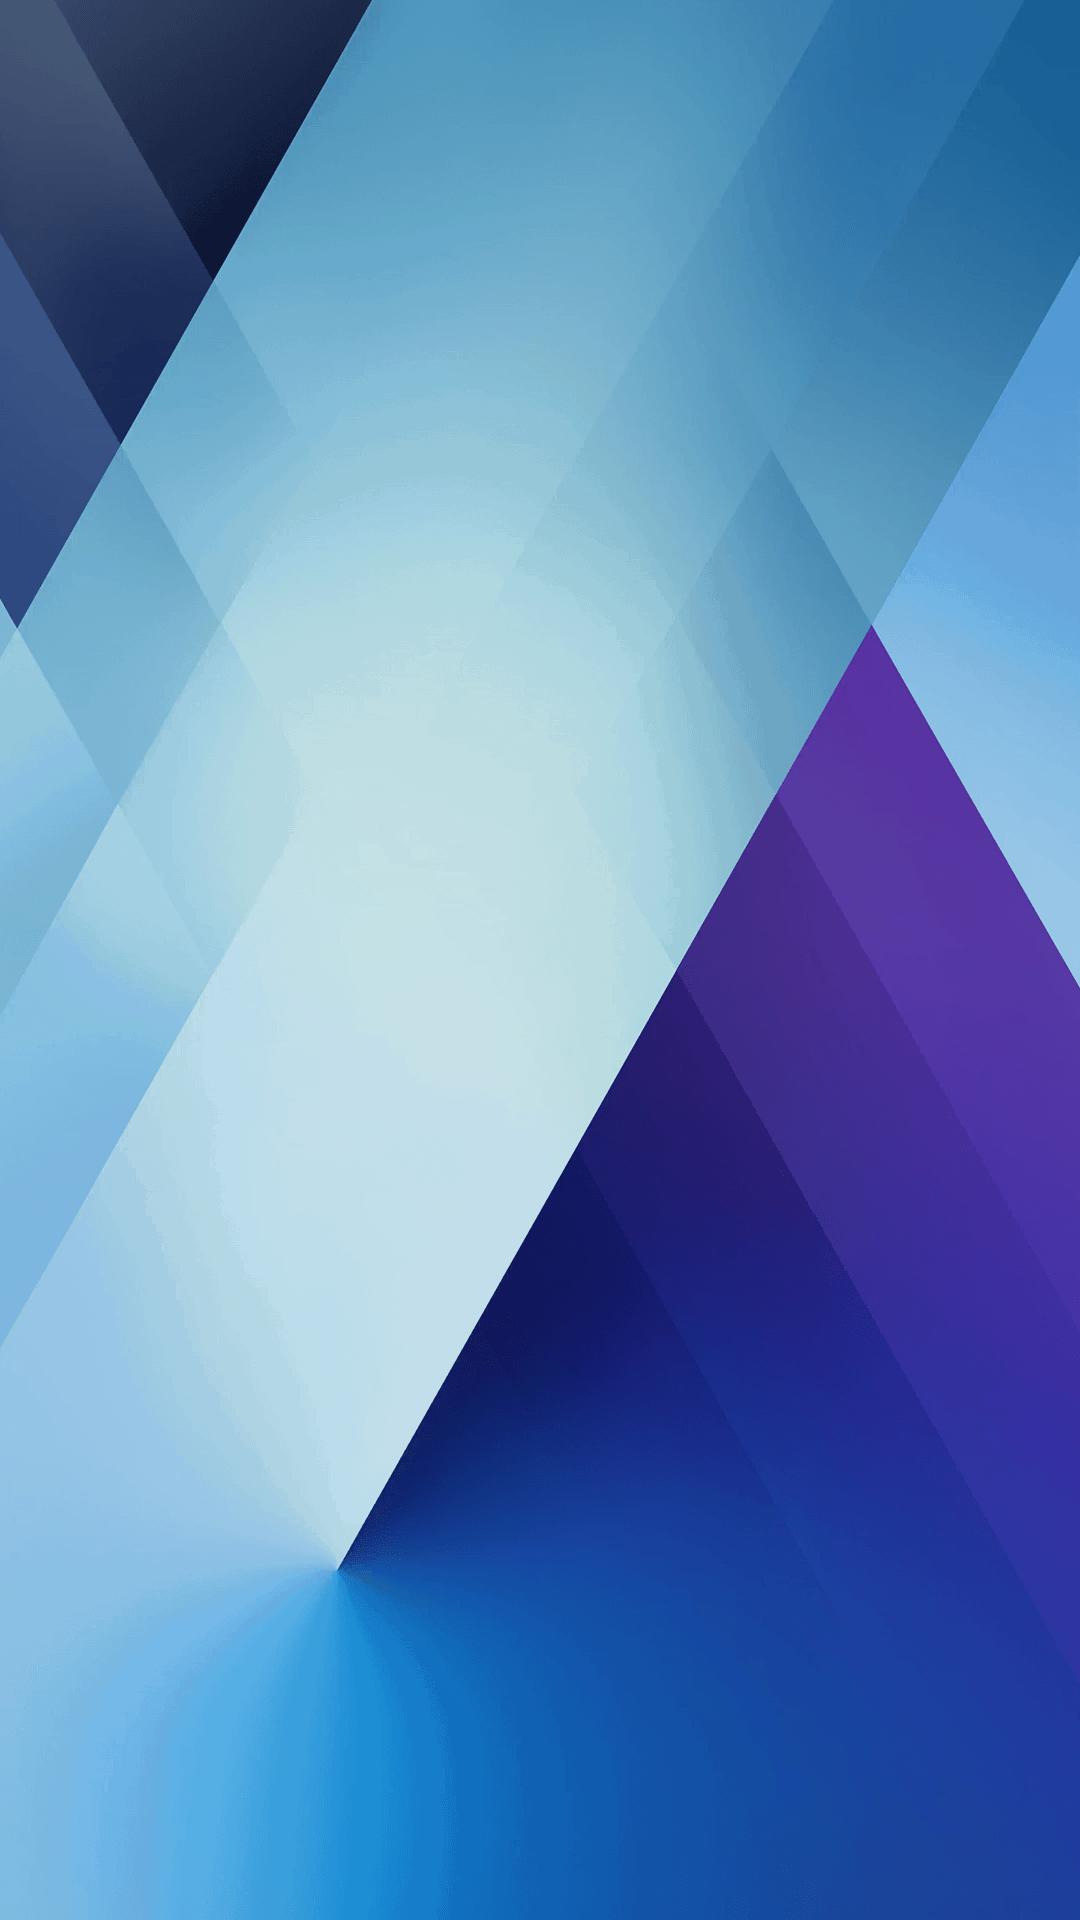 Galaxy a5 wallpaper hd download